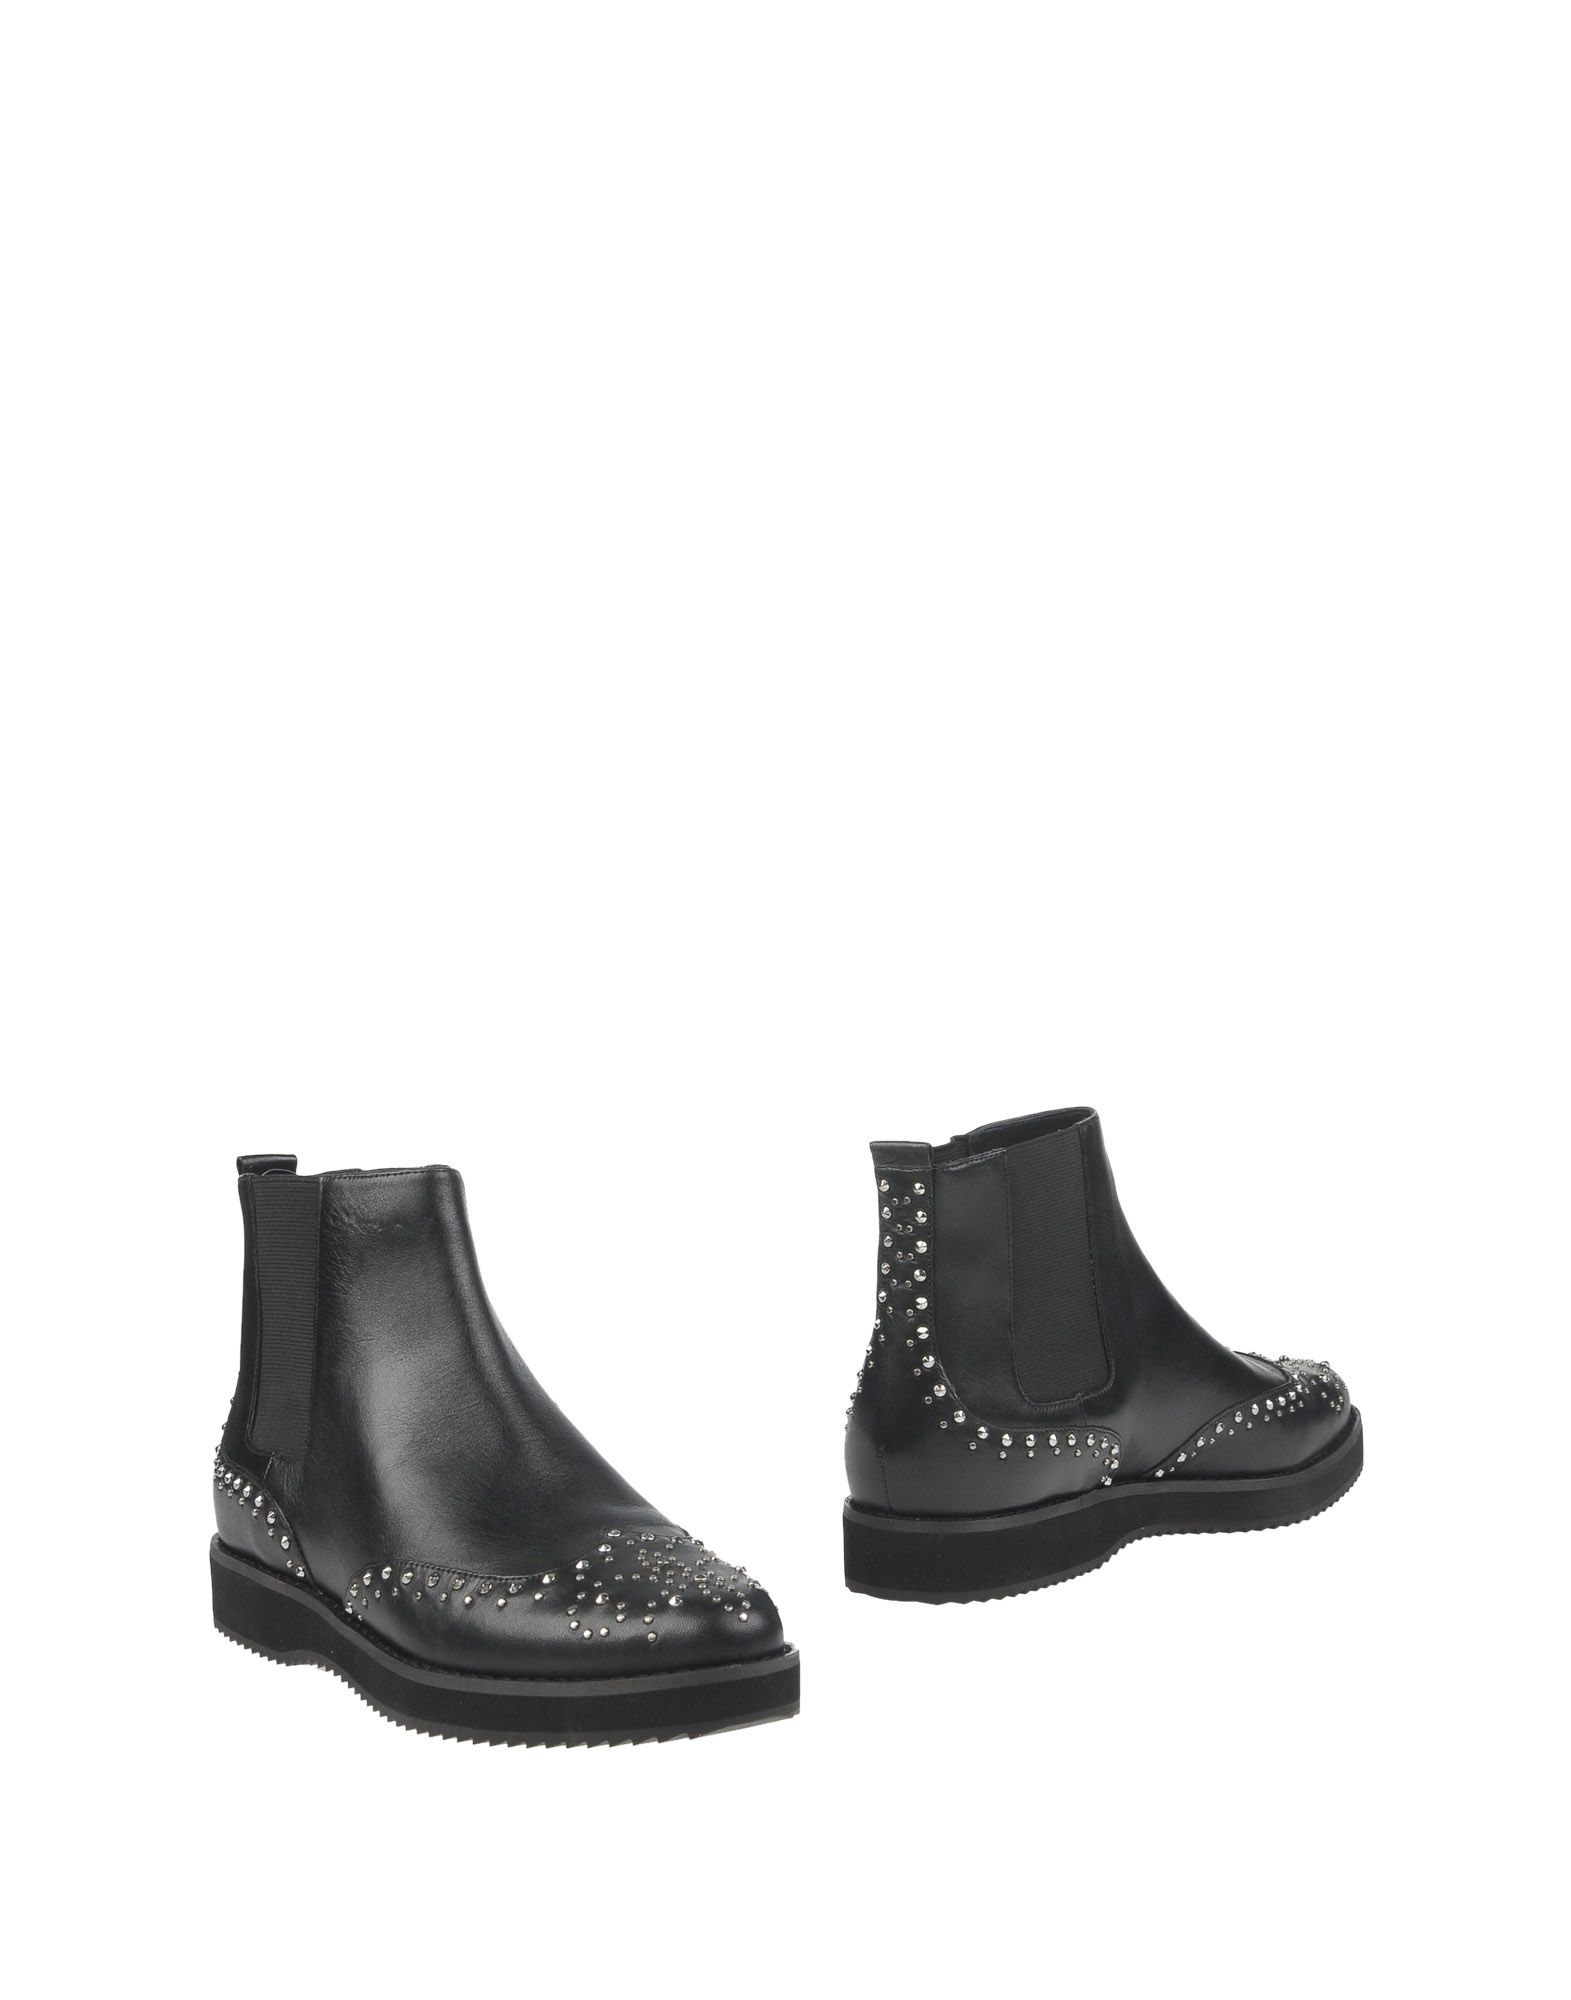 MICHAEL MICHAEL KORS Полусапоги и высокие ботинки michael kors полусапоги и высокие ботинки